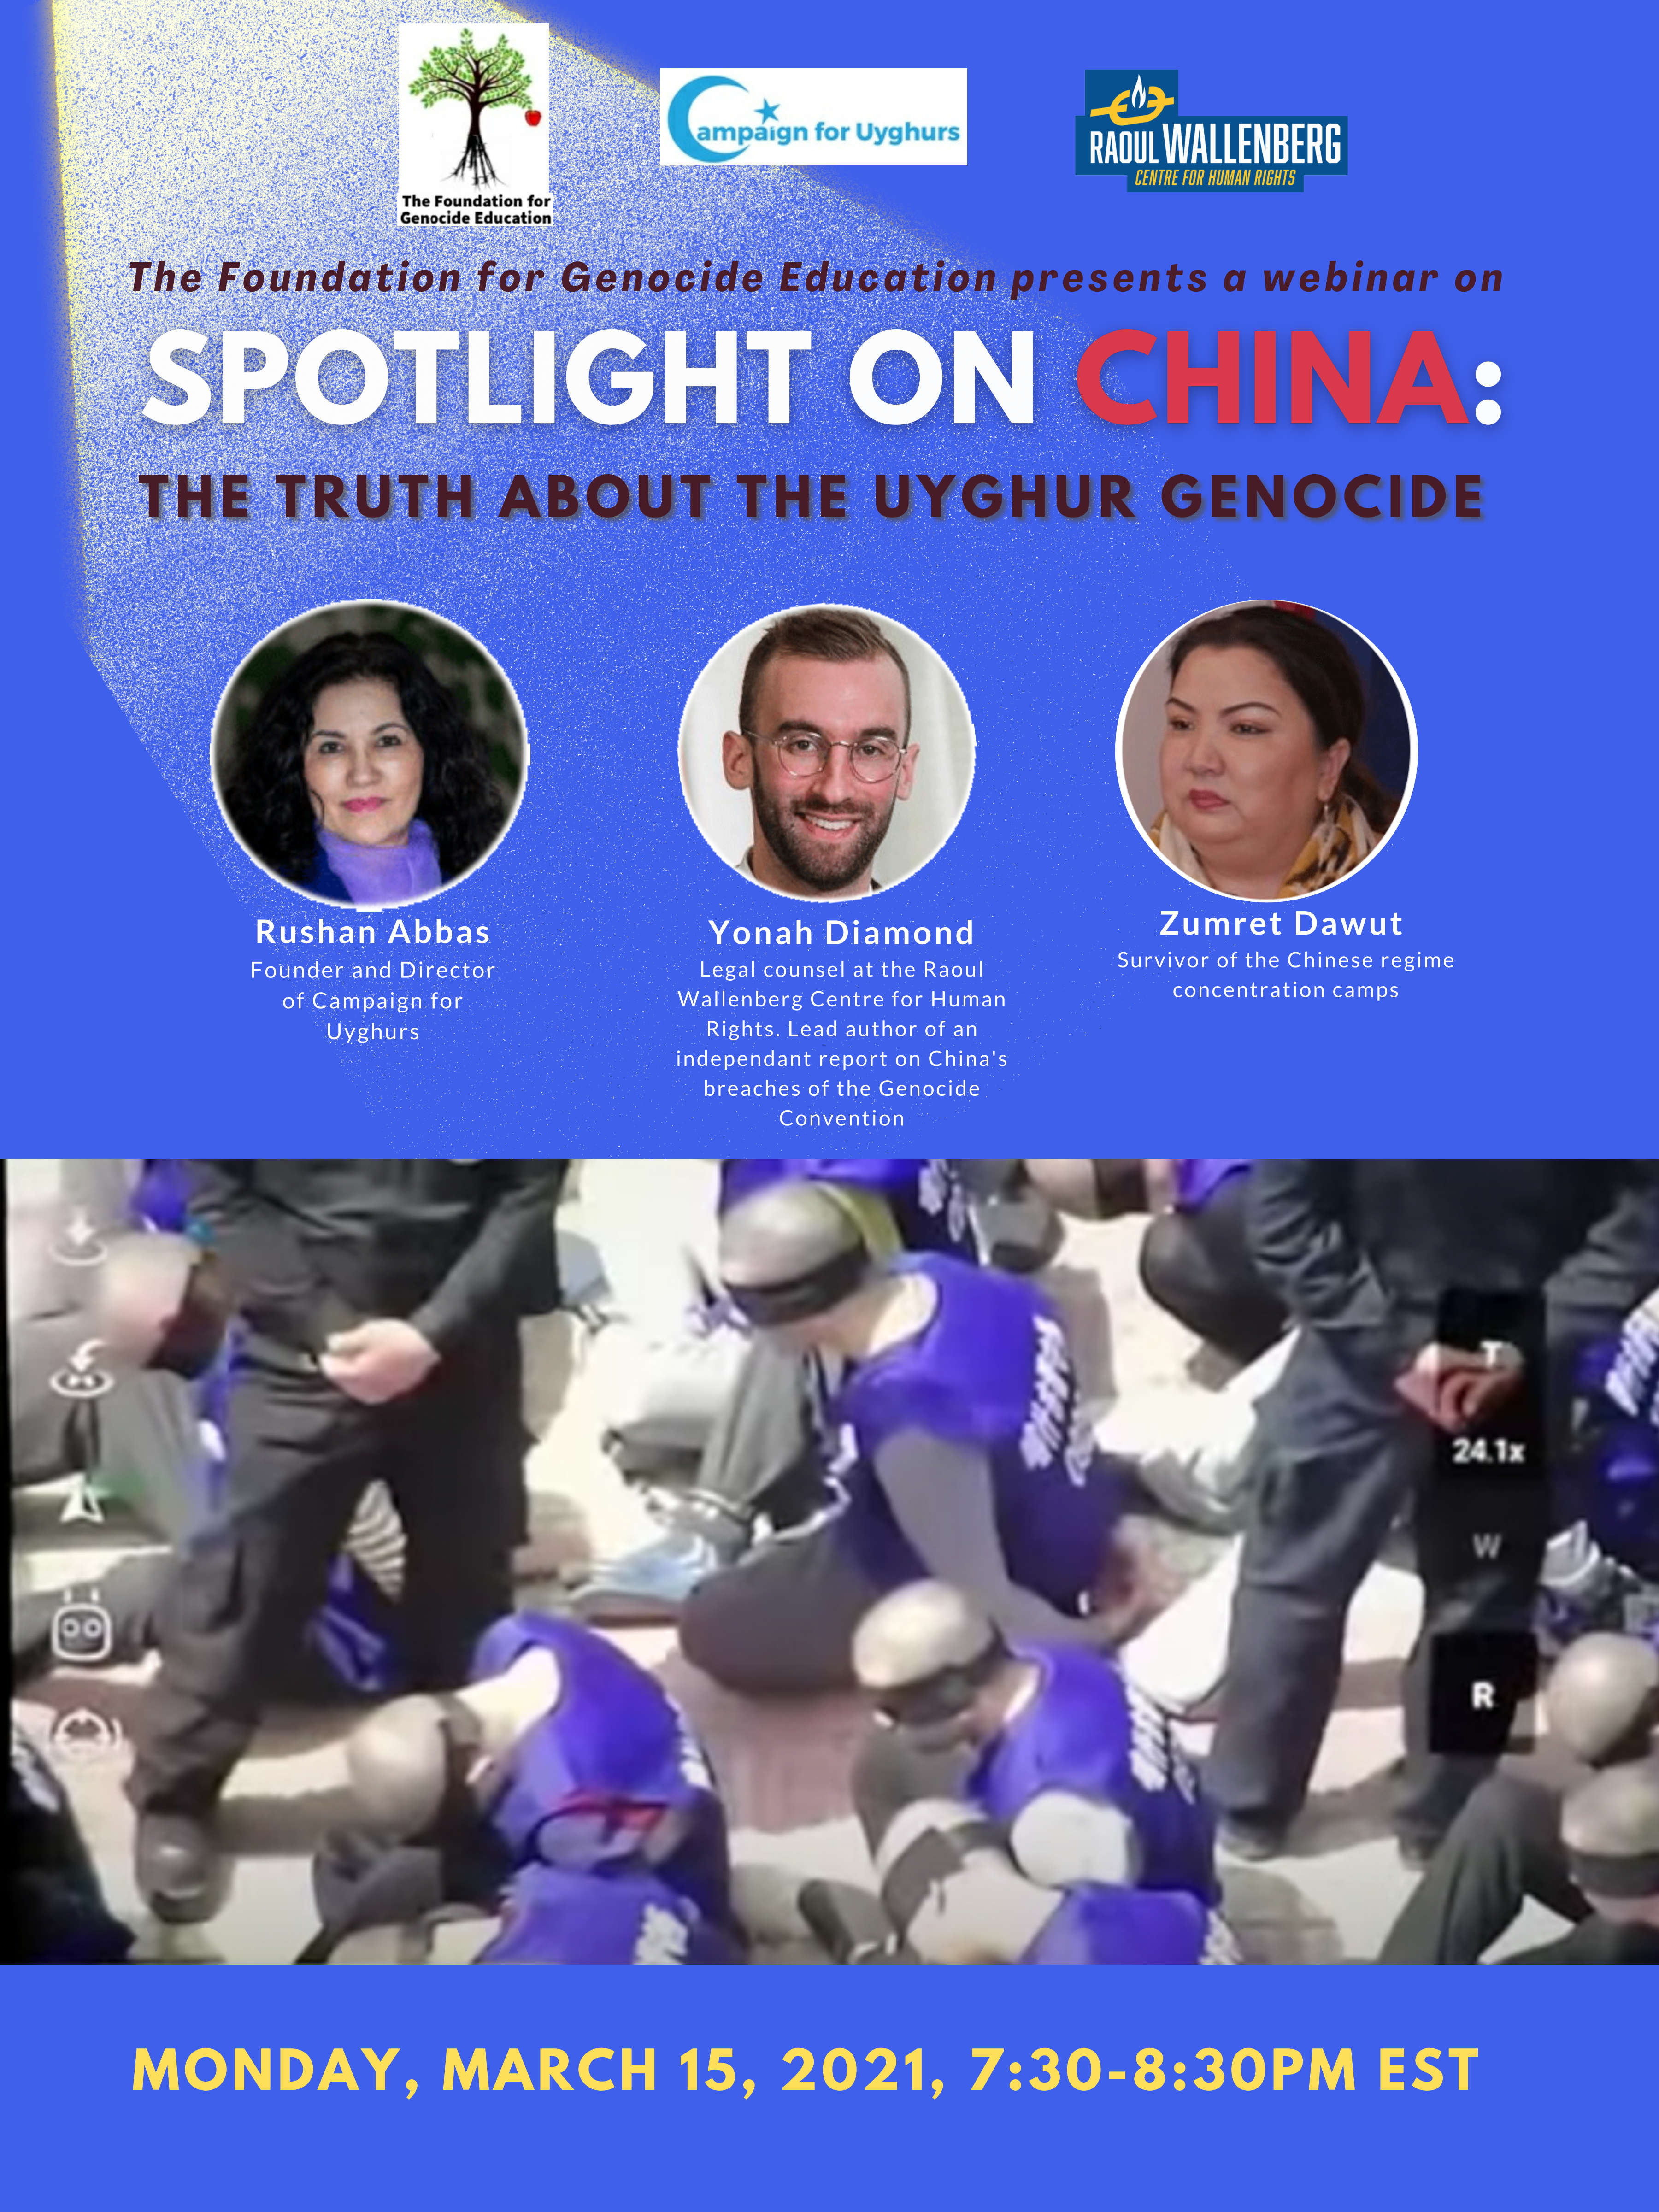 spotlight on china (5)_Page_1